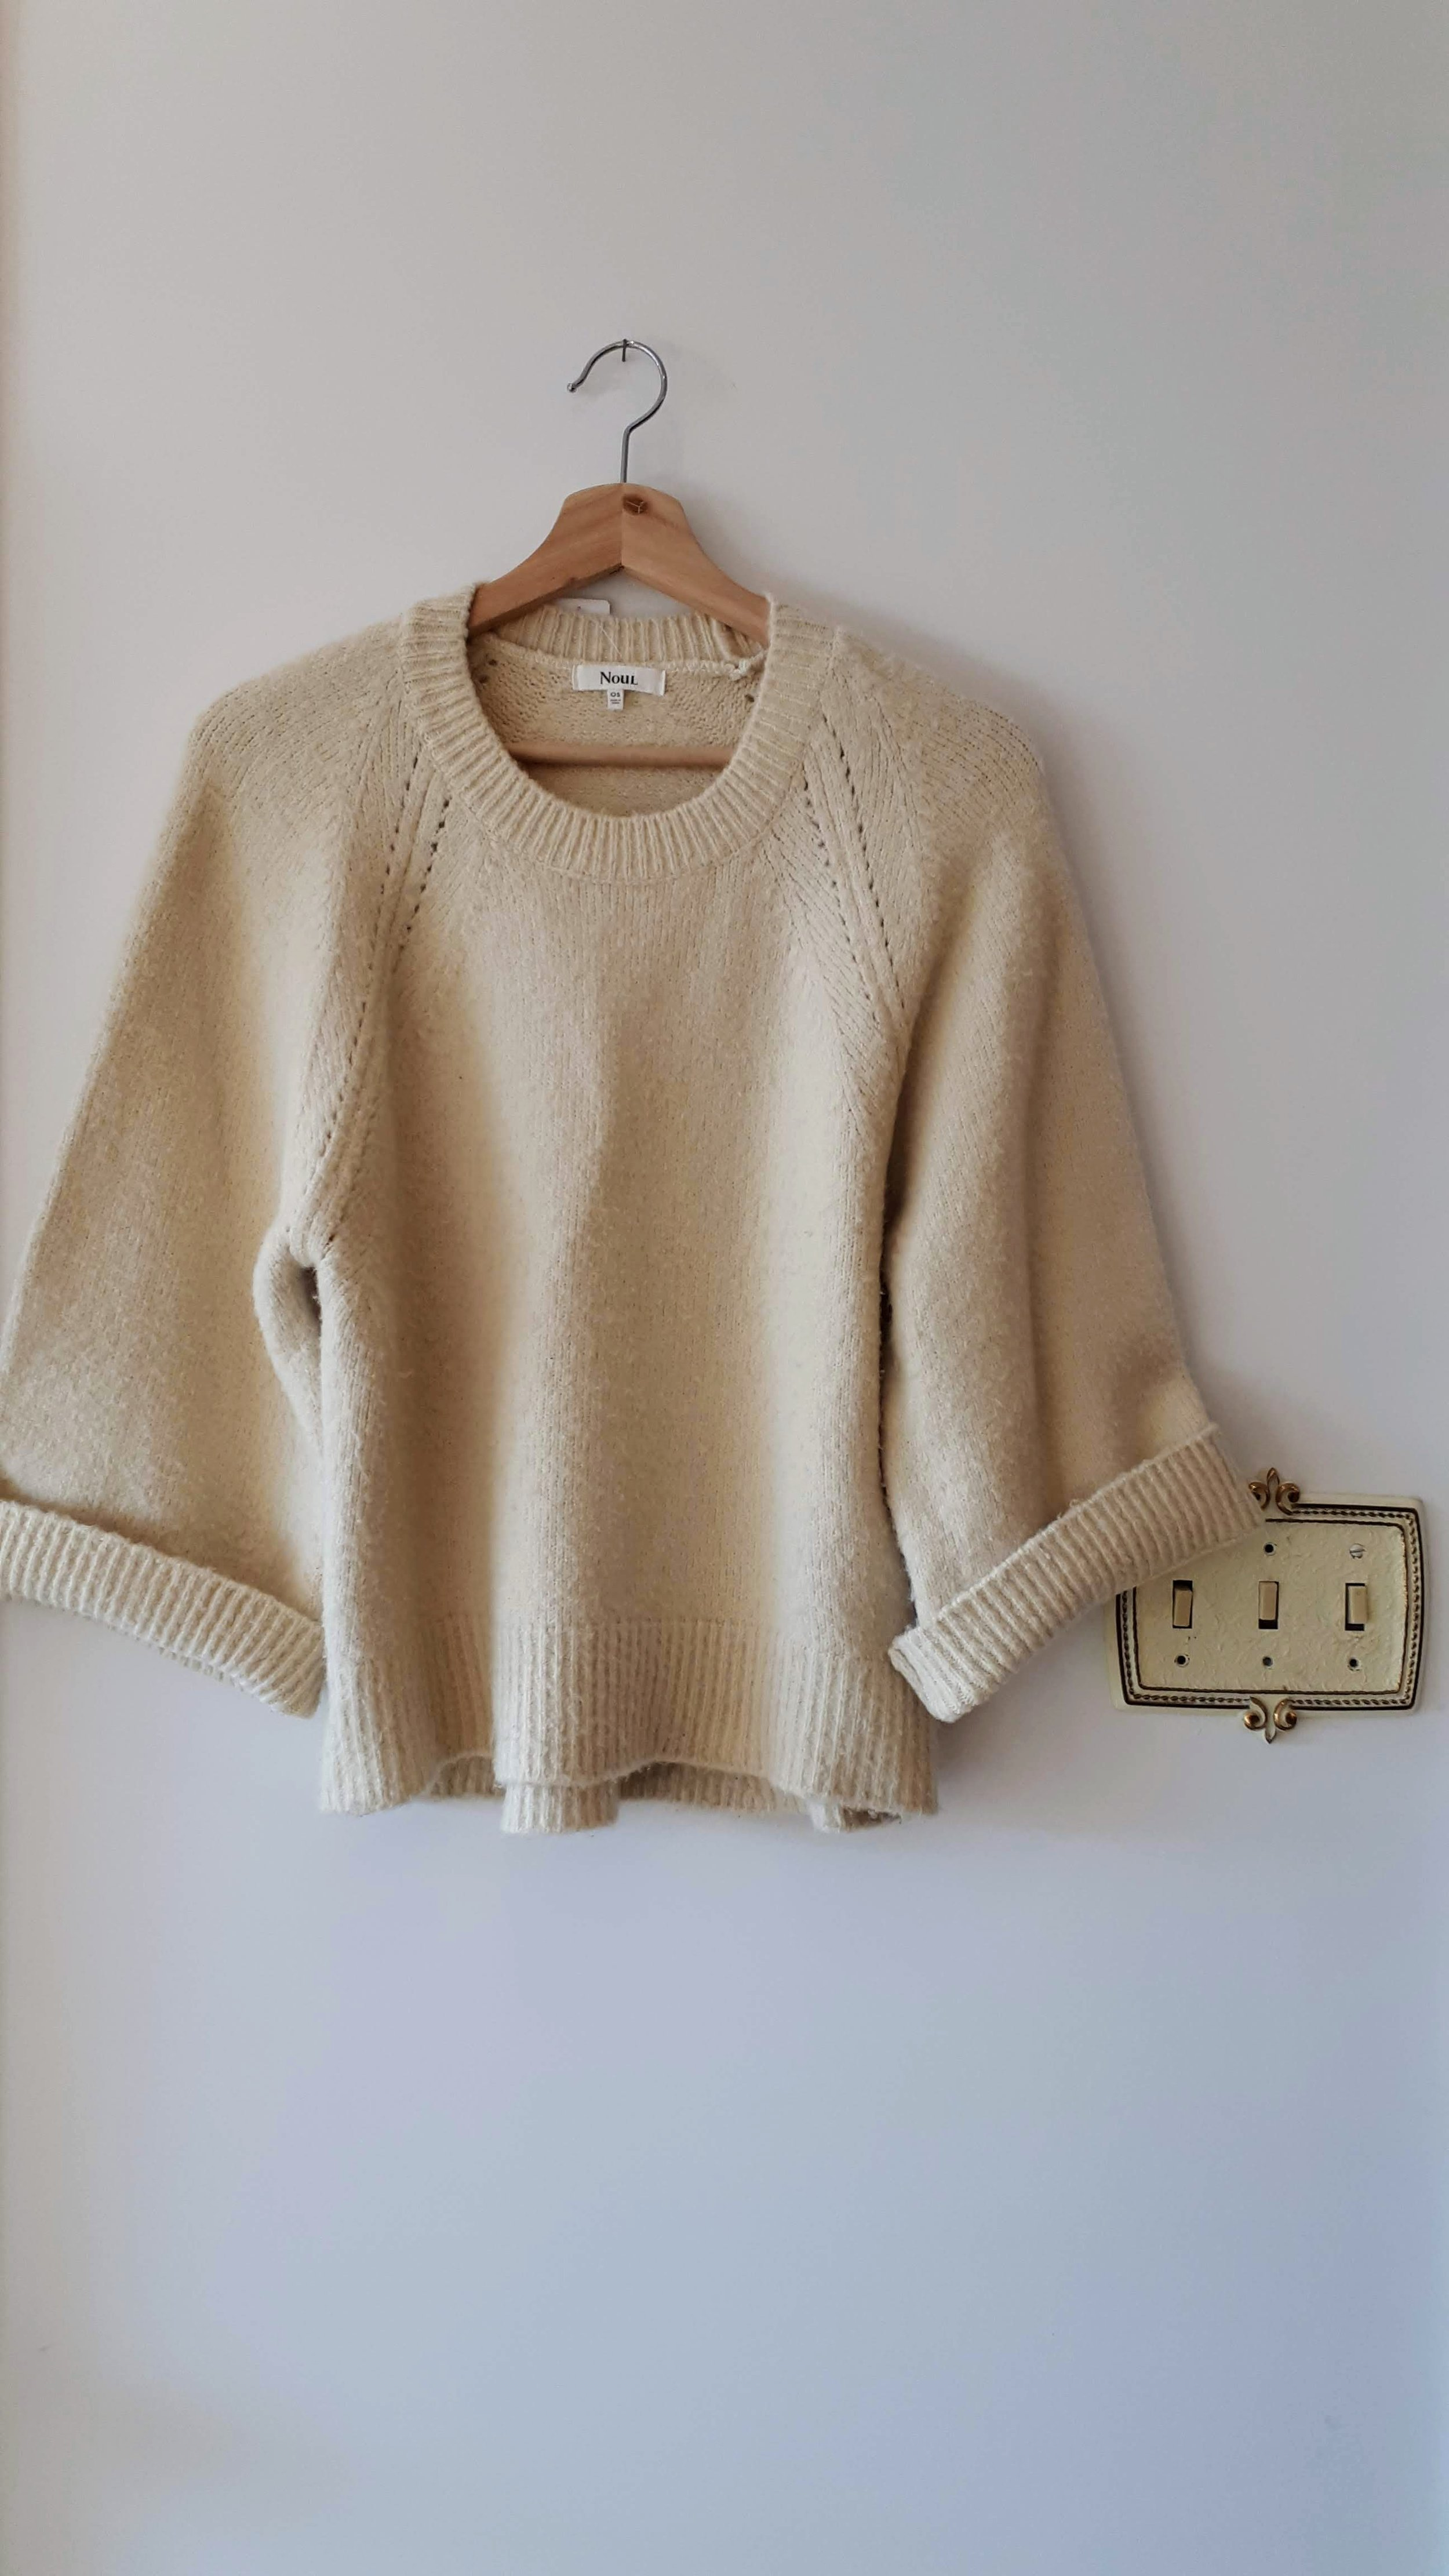 Noul sweater; Size M, $34